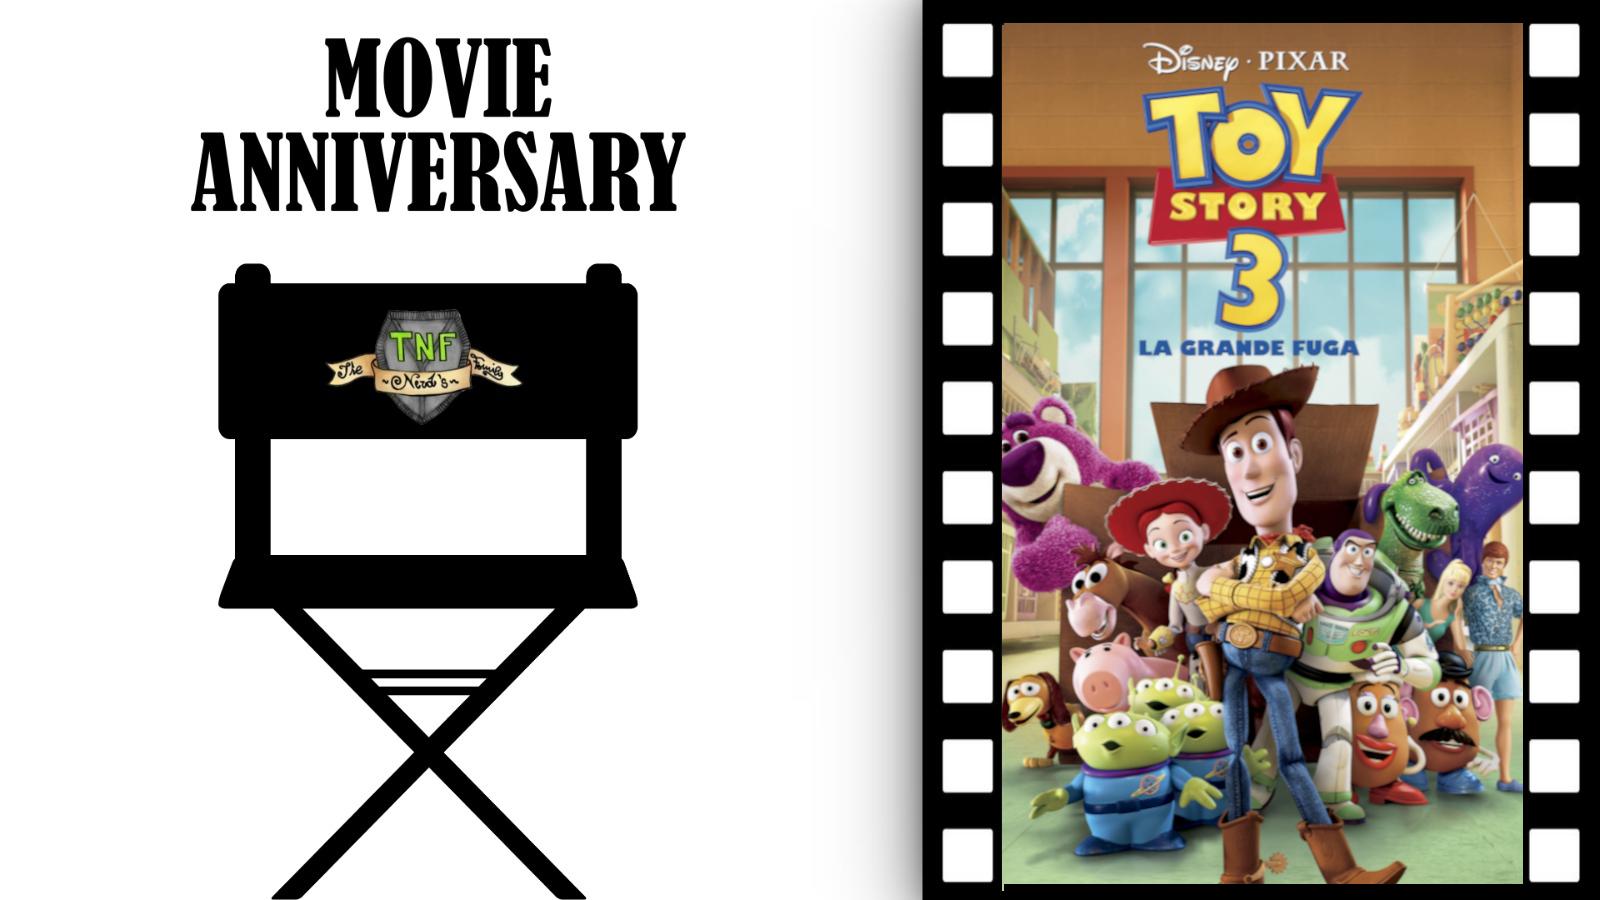 toy story 3 _movieanniversary